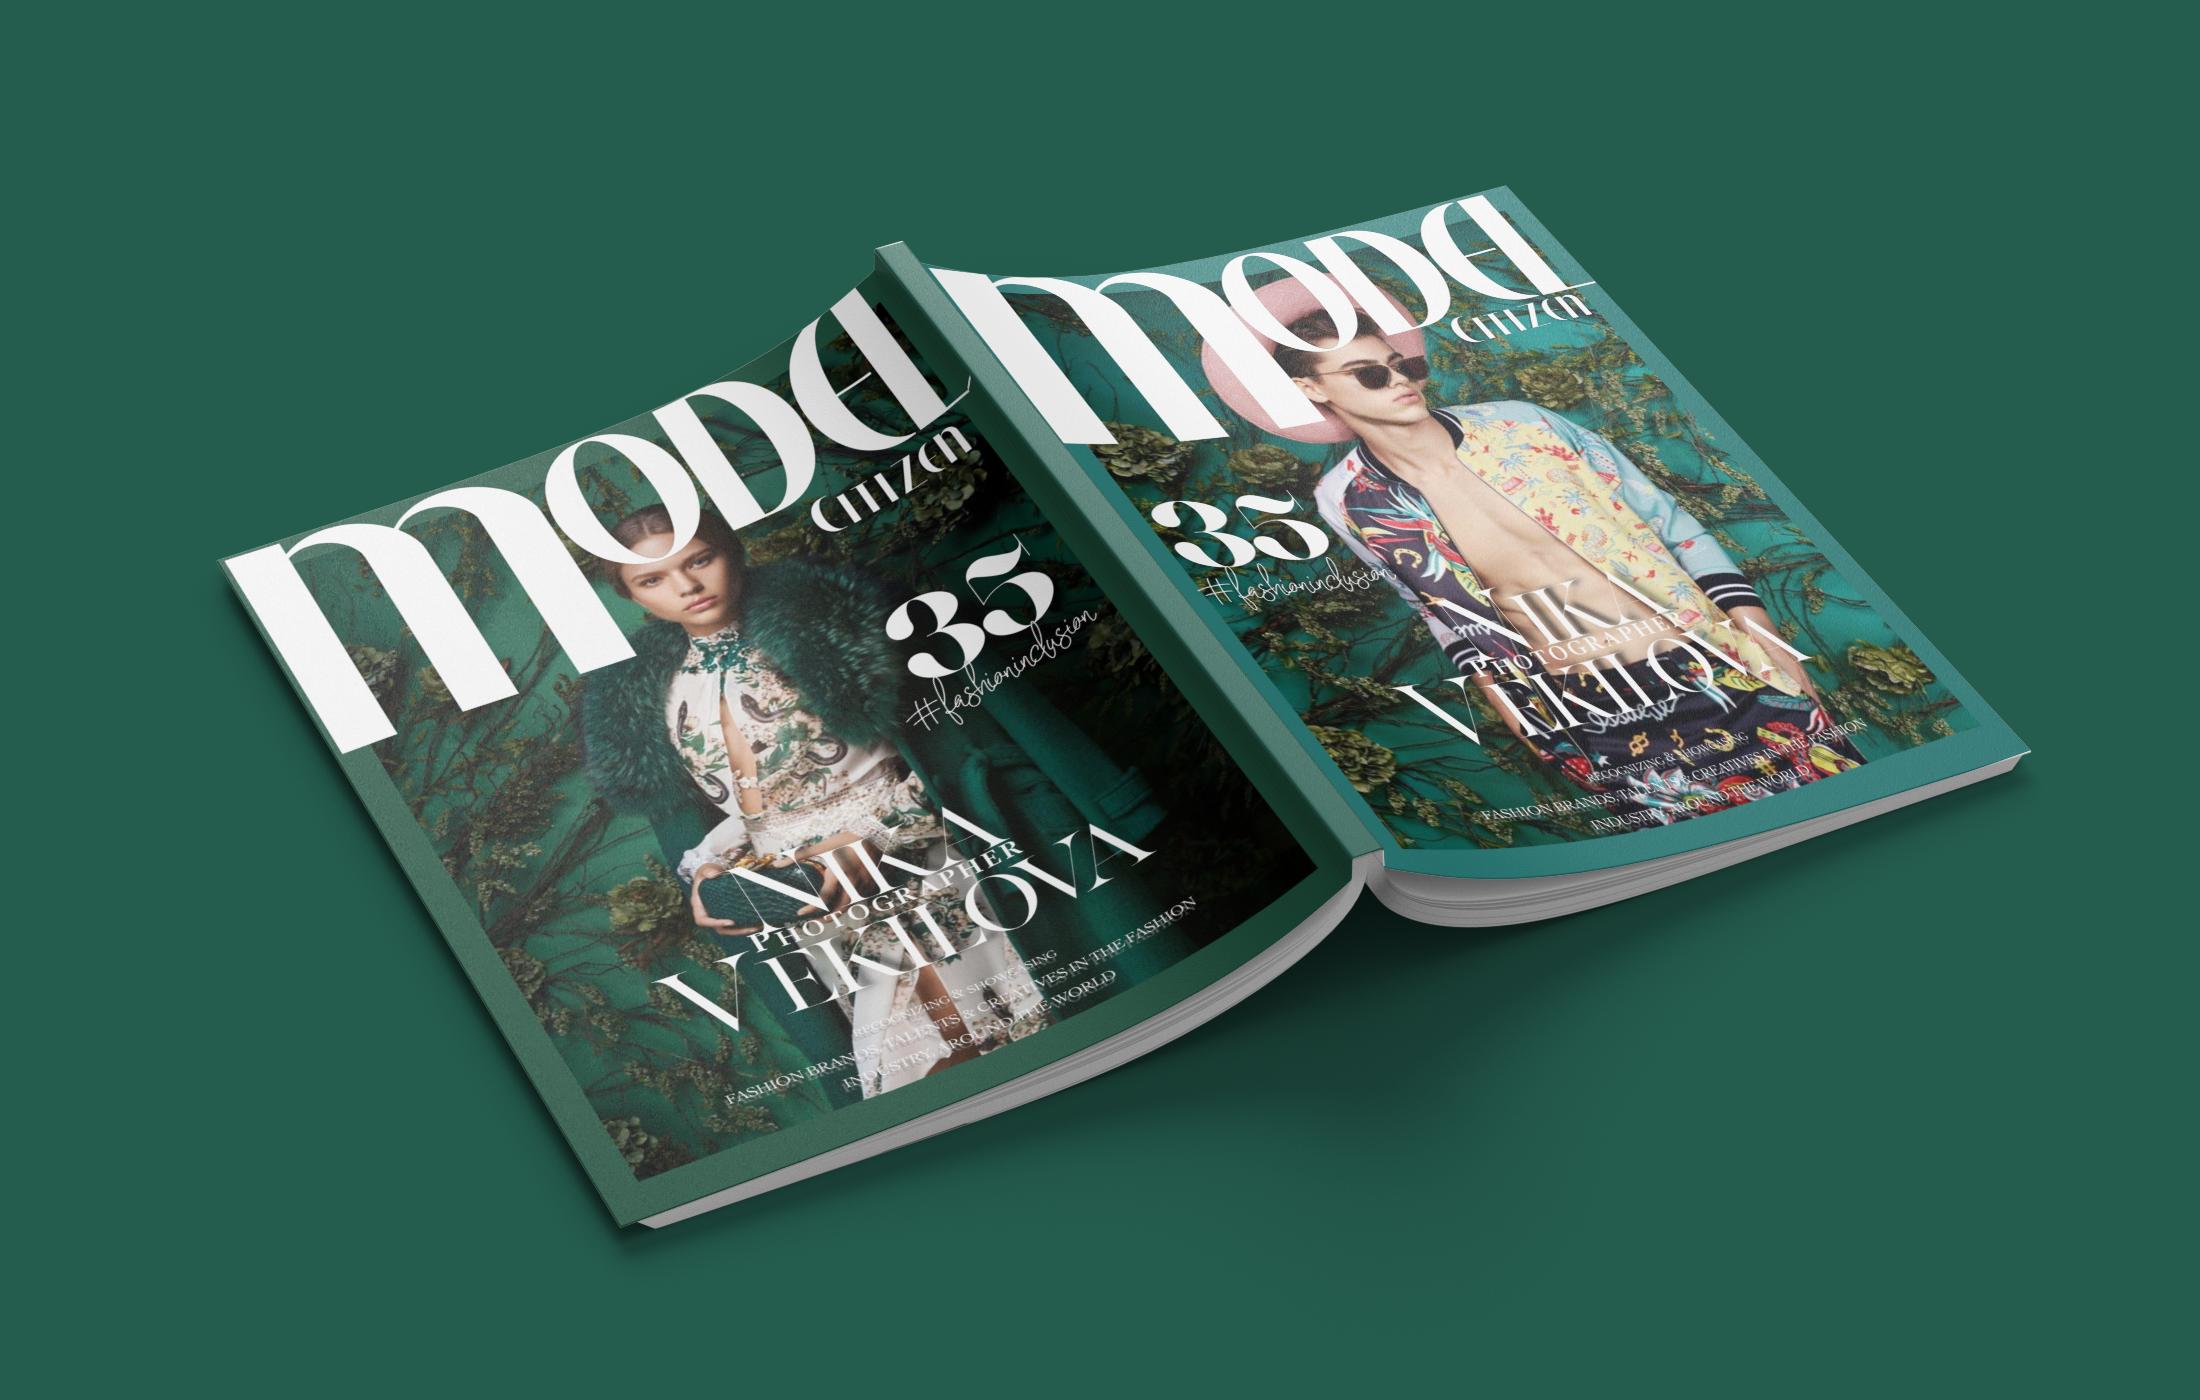 Model Citizen Magazine Issue 35, Macky Suson, Fashion Inclusion Now5.png